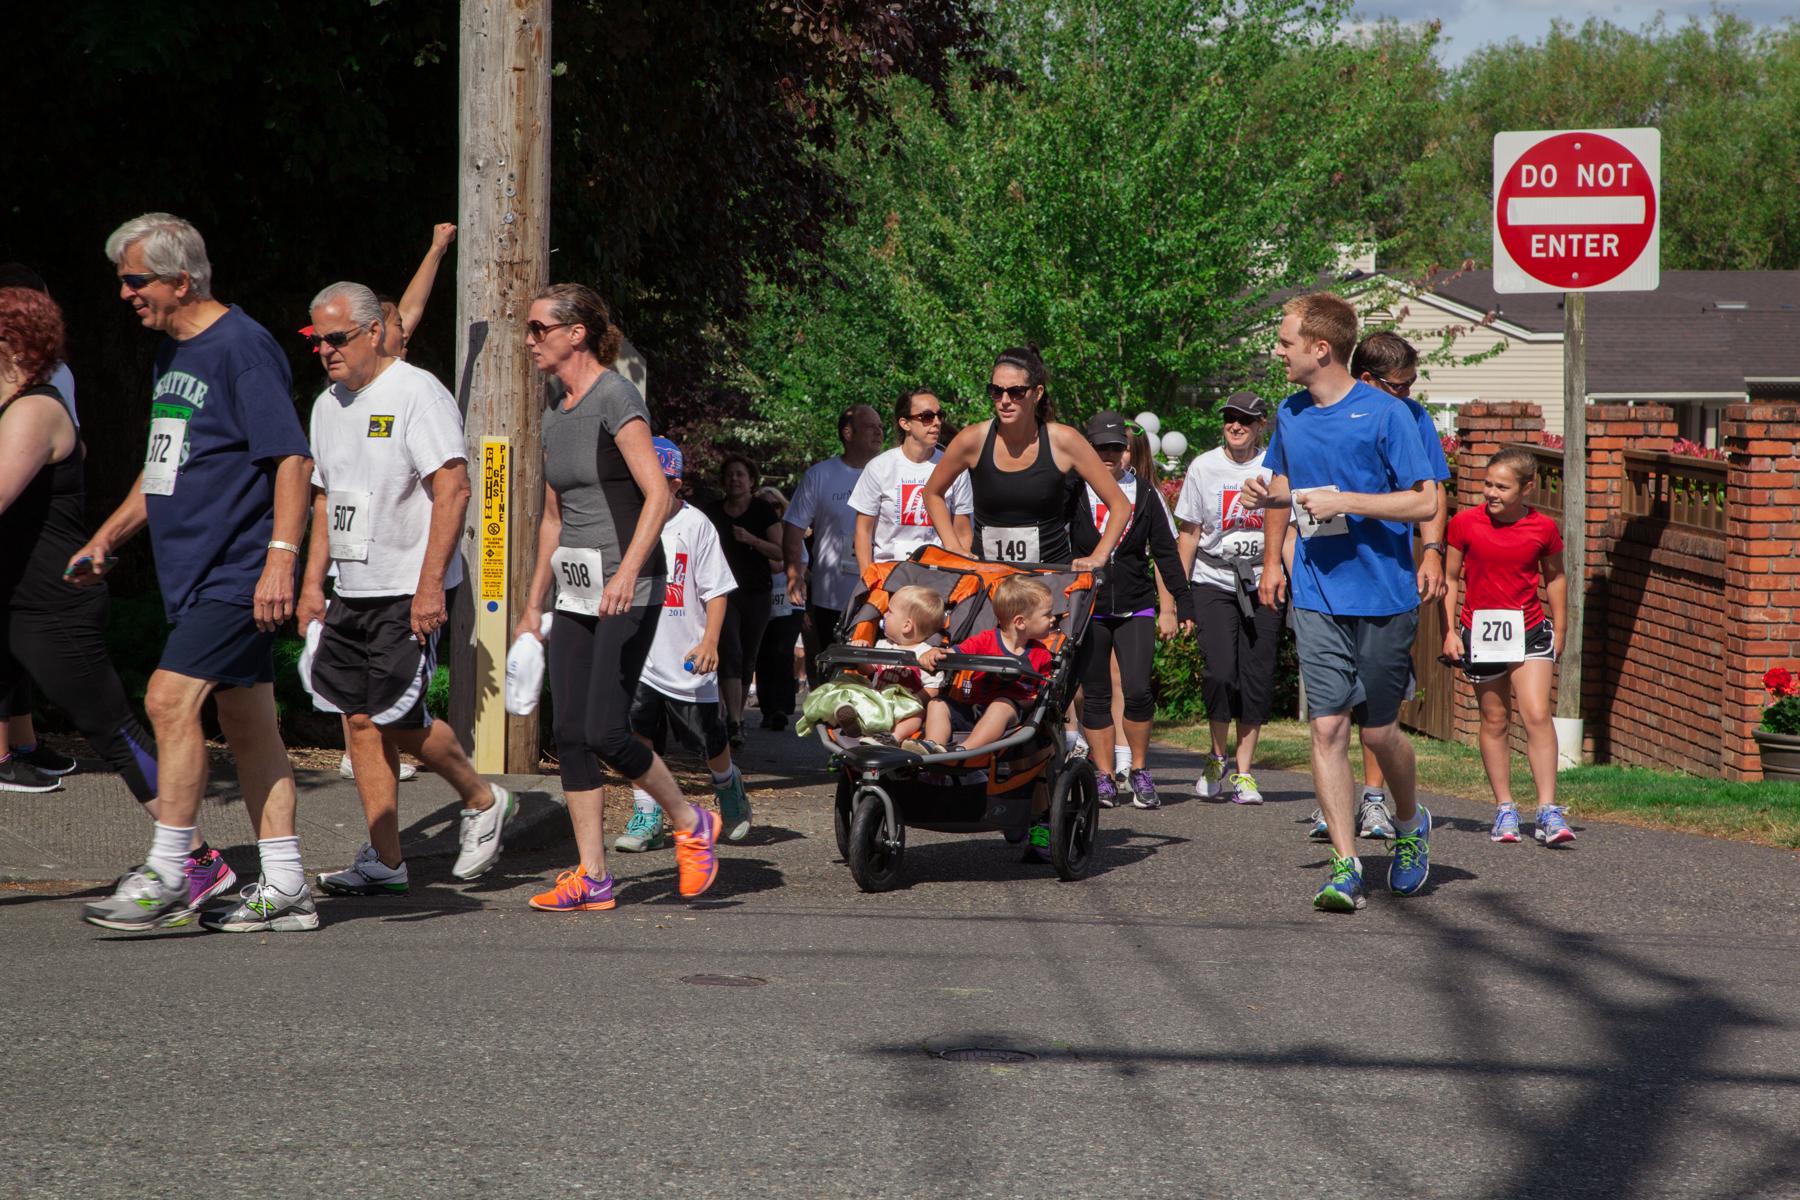 2014 - 5K 4th of July Run-9560